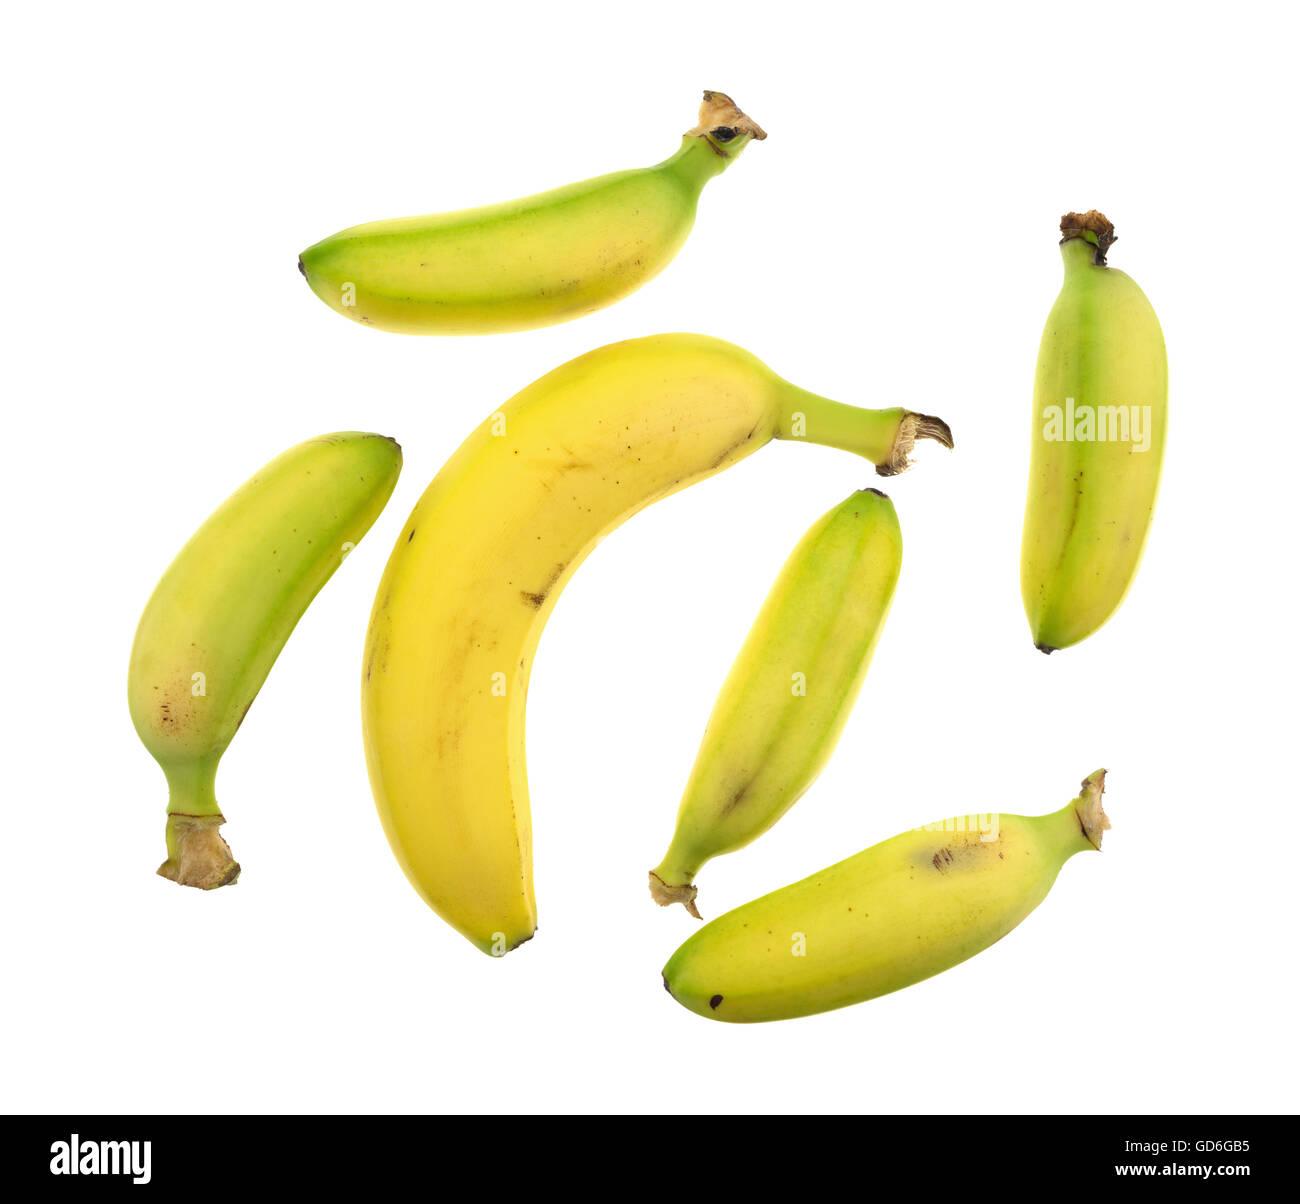 Five Photographs Of Banana In Seach Of >> A Group Of Five Small Bananas Surrounding A Regular Size Banana